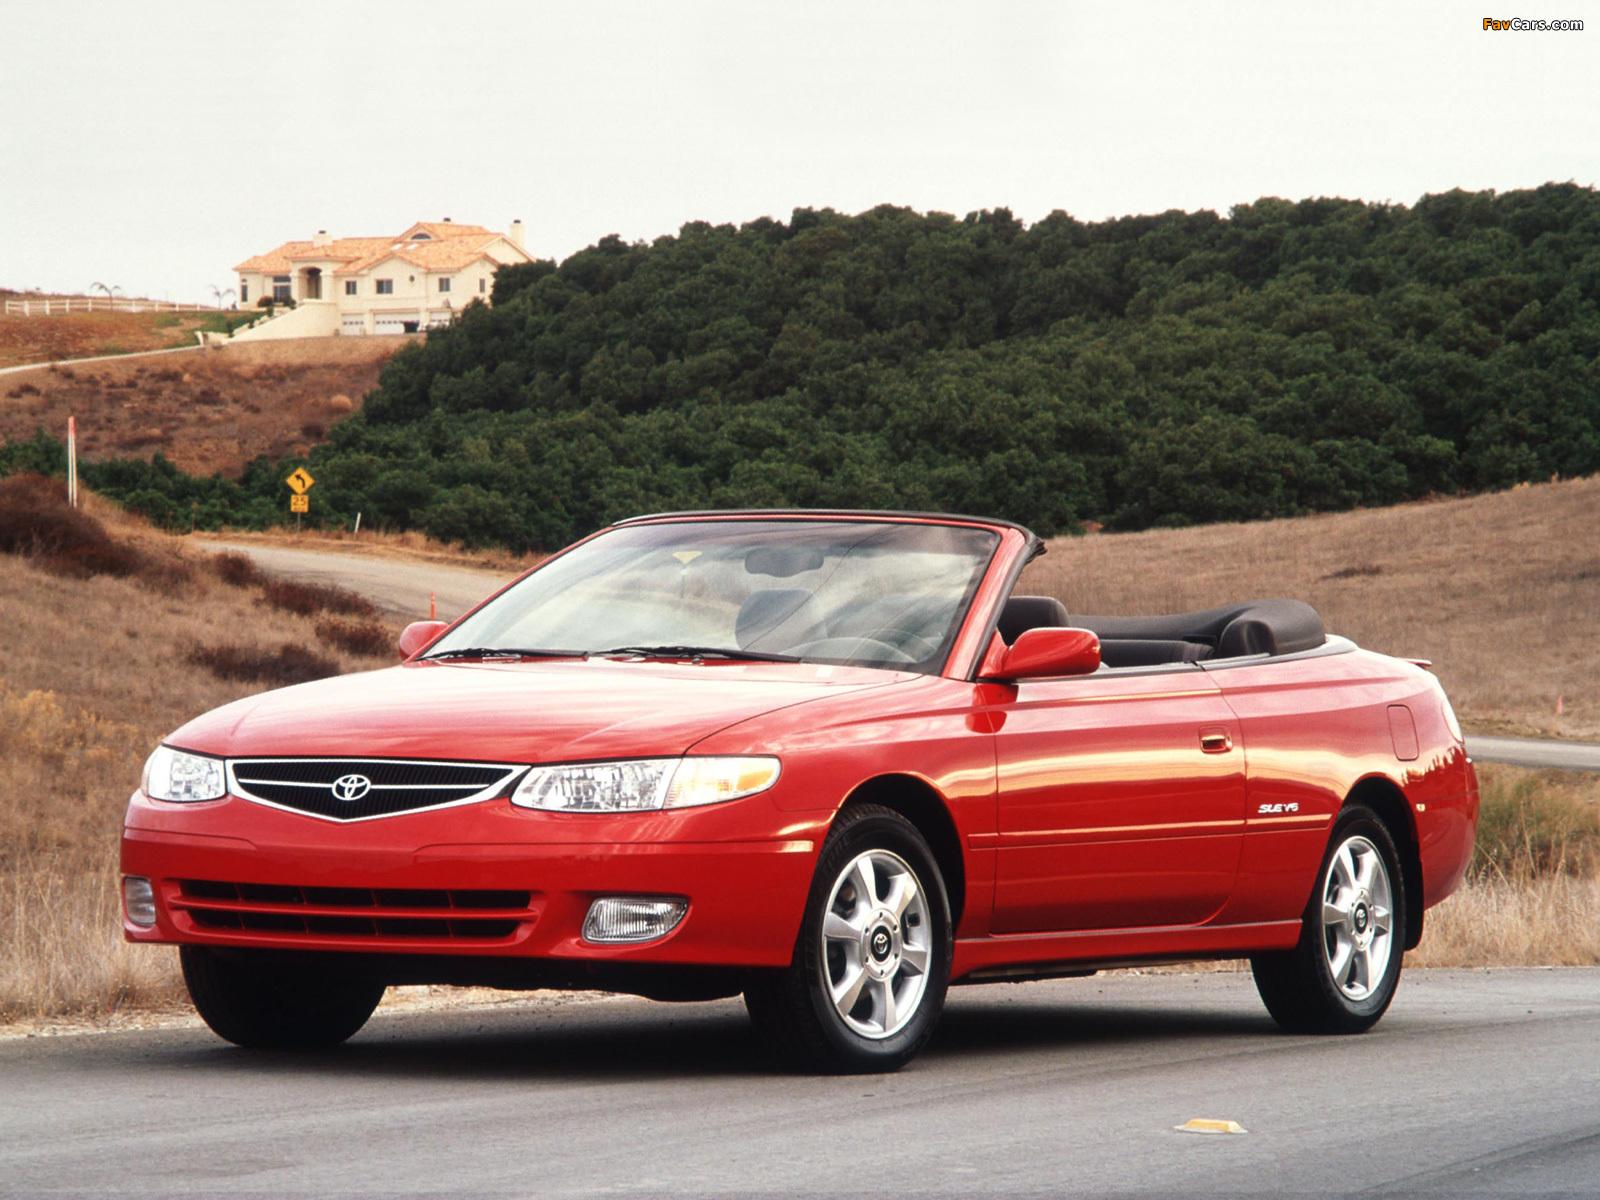 1999 Toyota Camry Solara Image 10